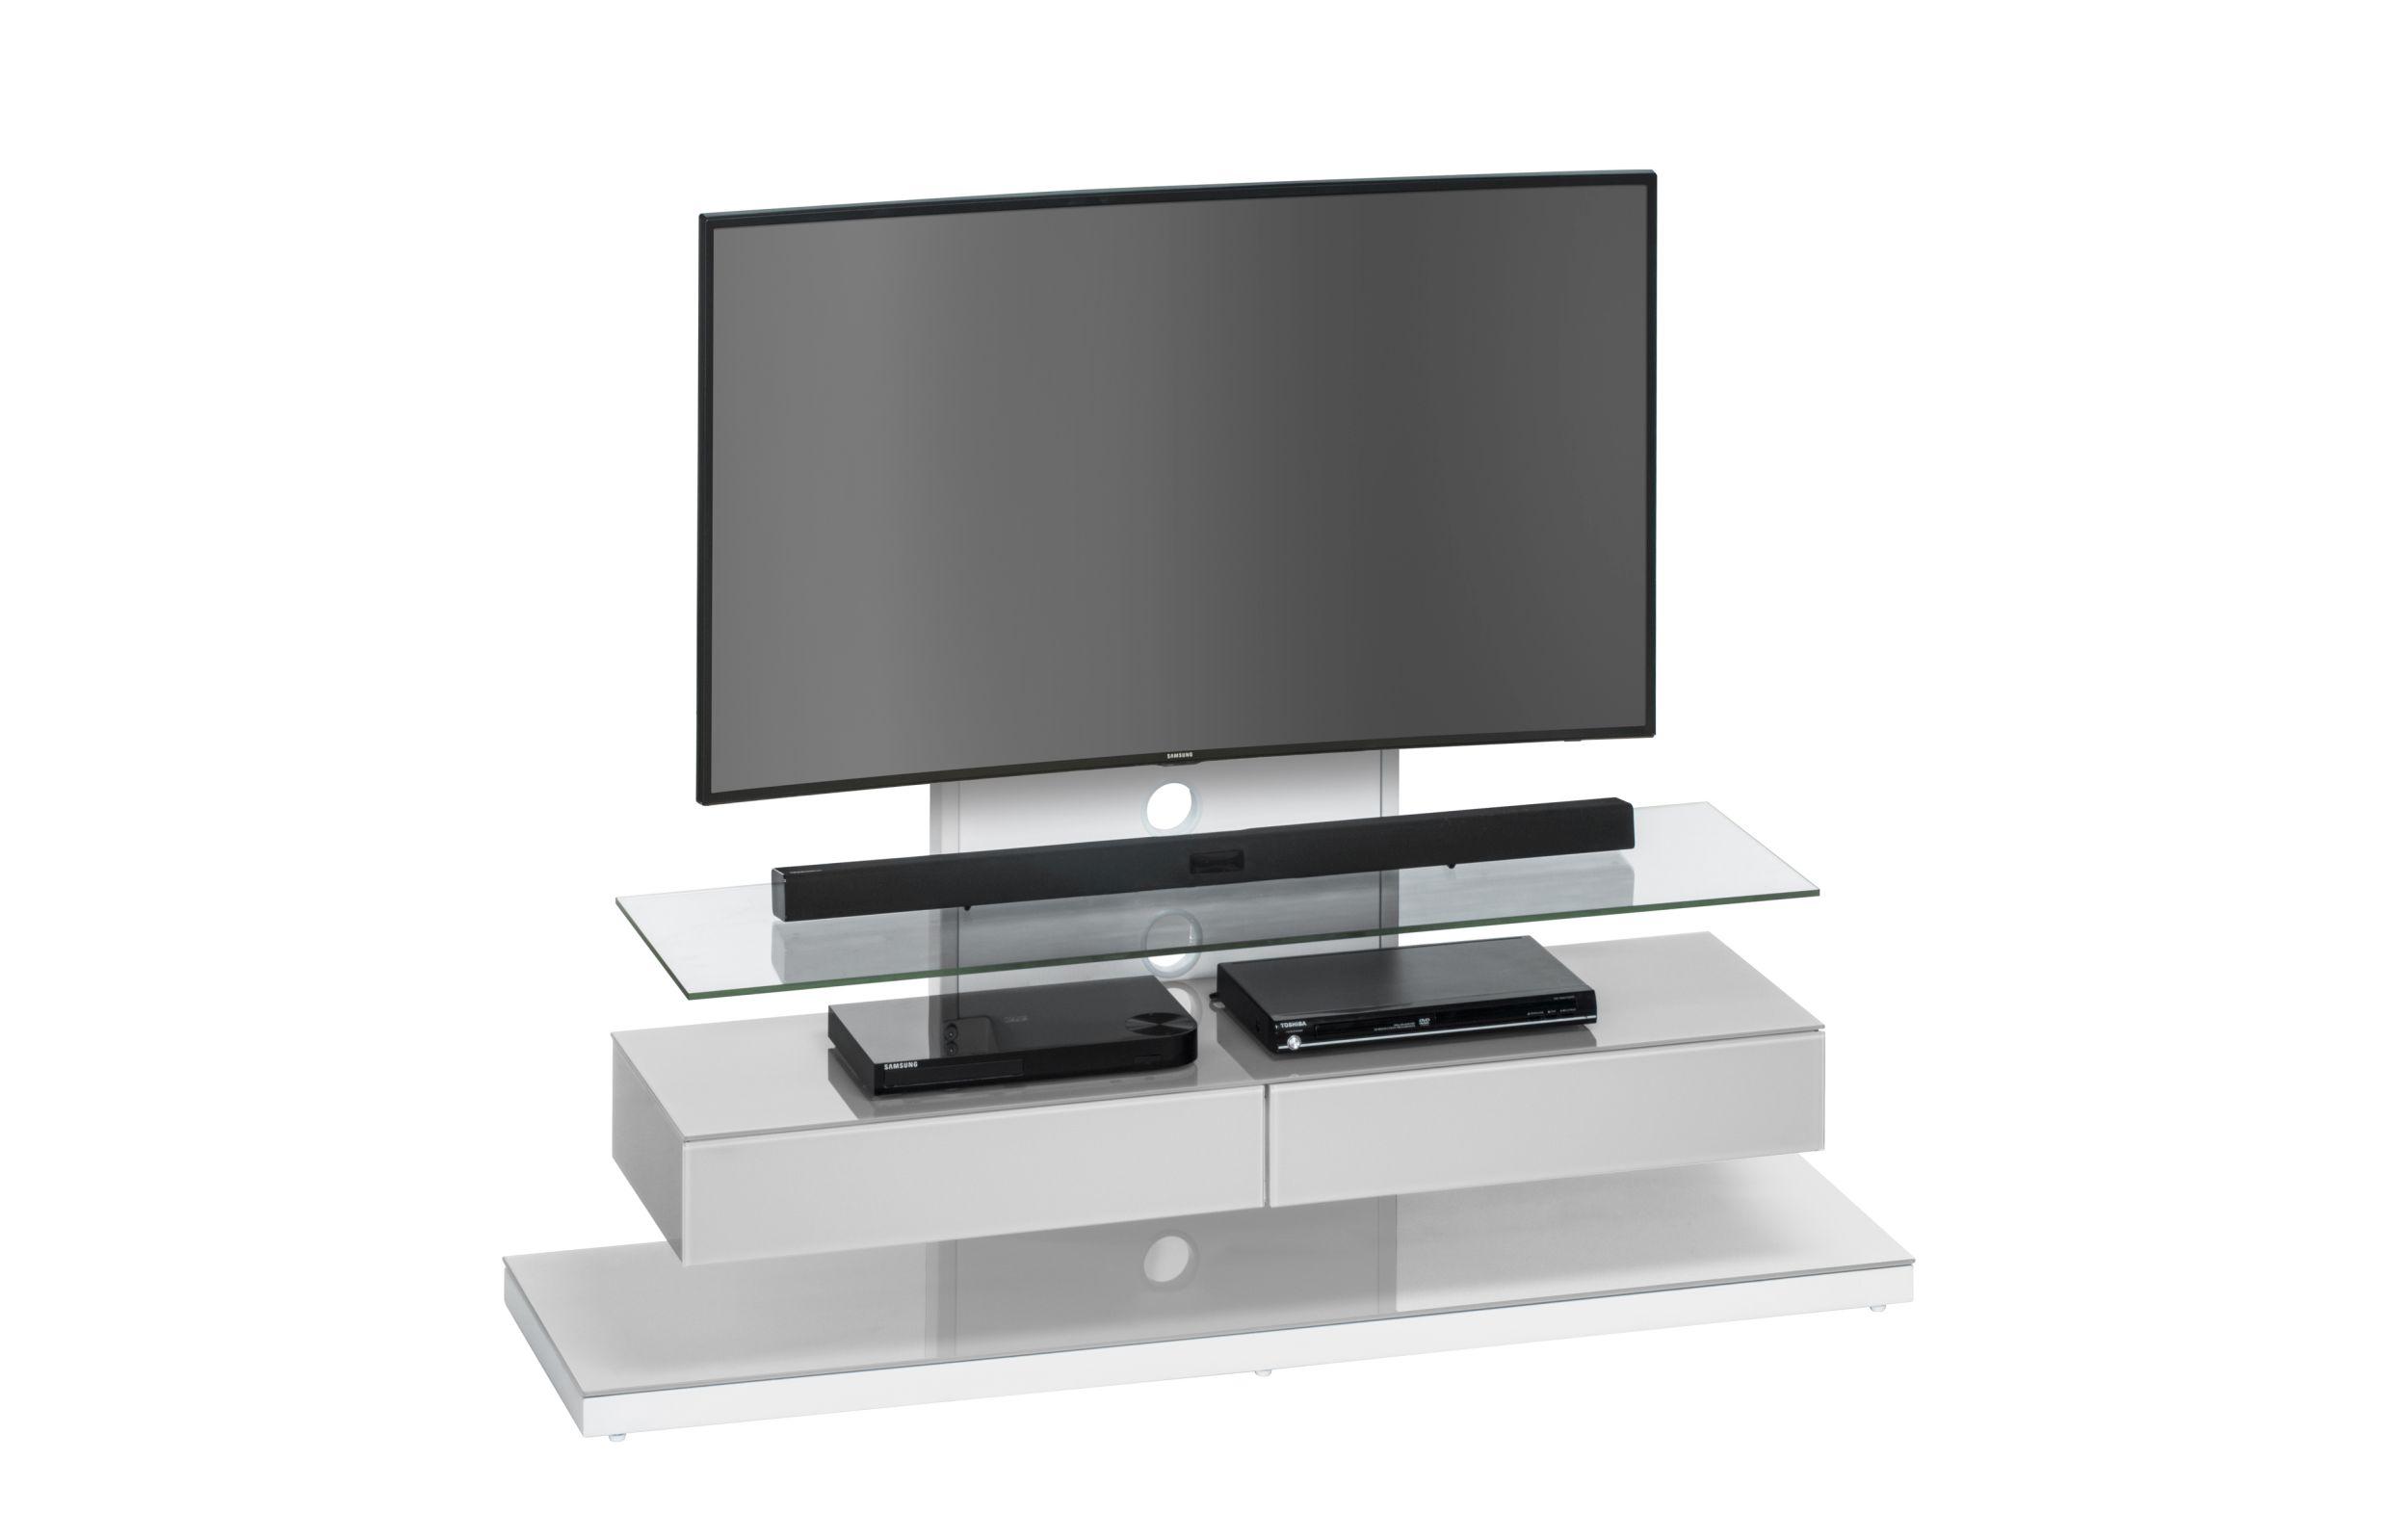 TV-Rack Hifi Ablage Glas Design Mod.MJ082 Metall Weiß